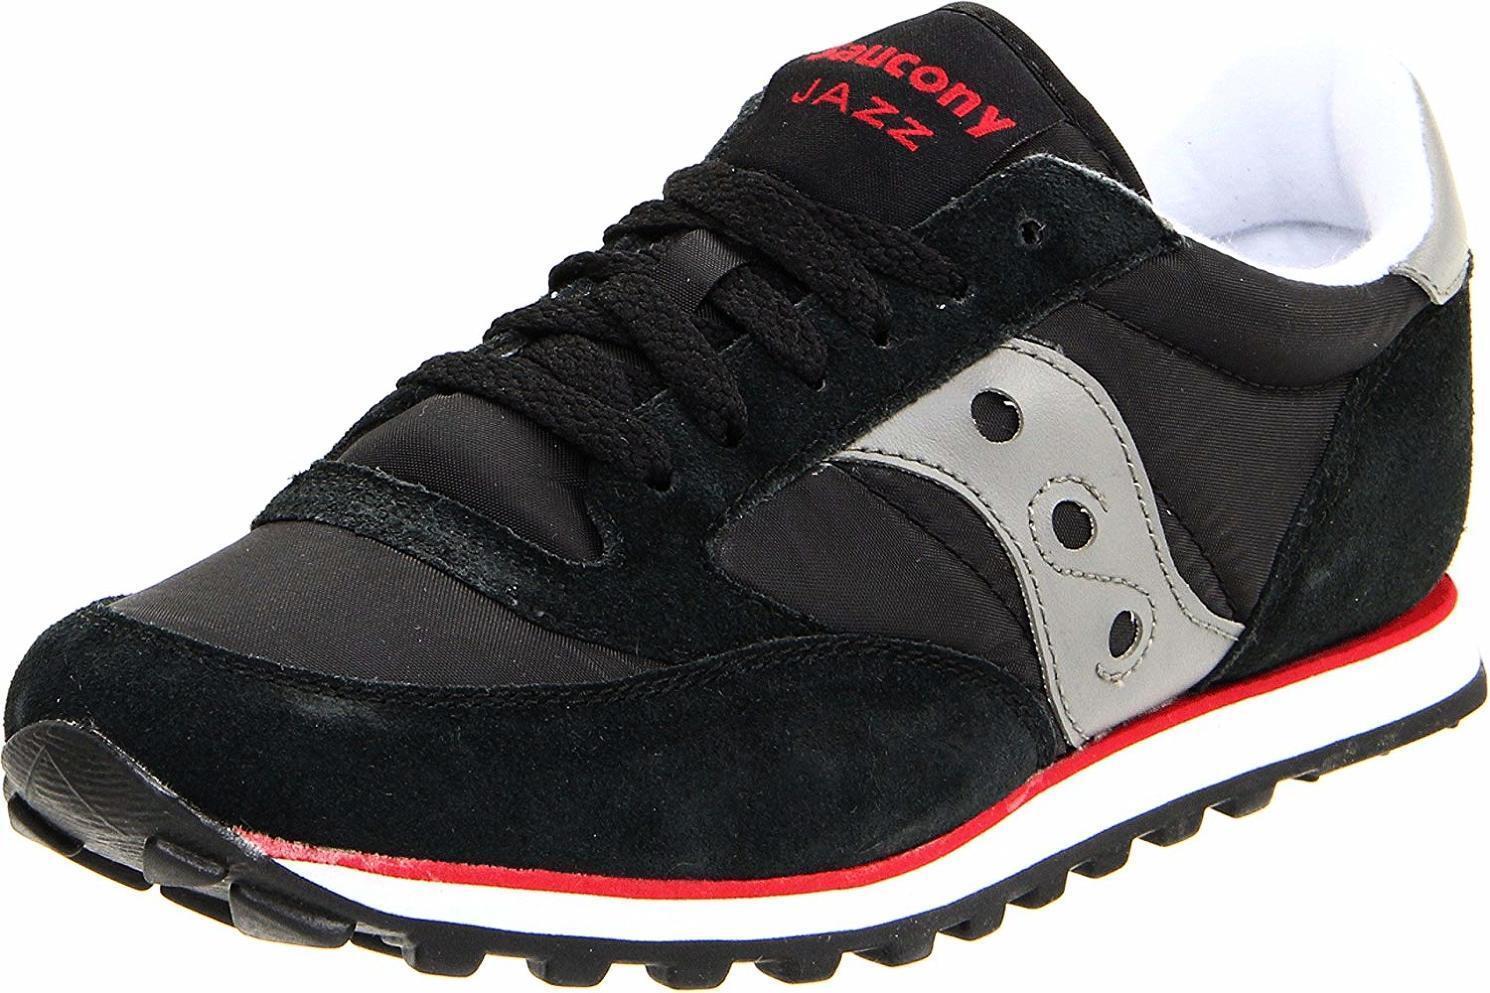 Saucony Originals Jazz Low Pro Sneaker - Choose SZ color